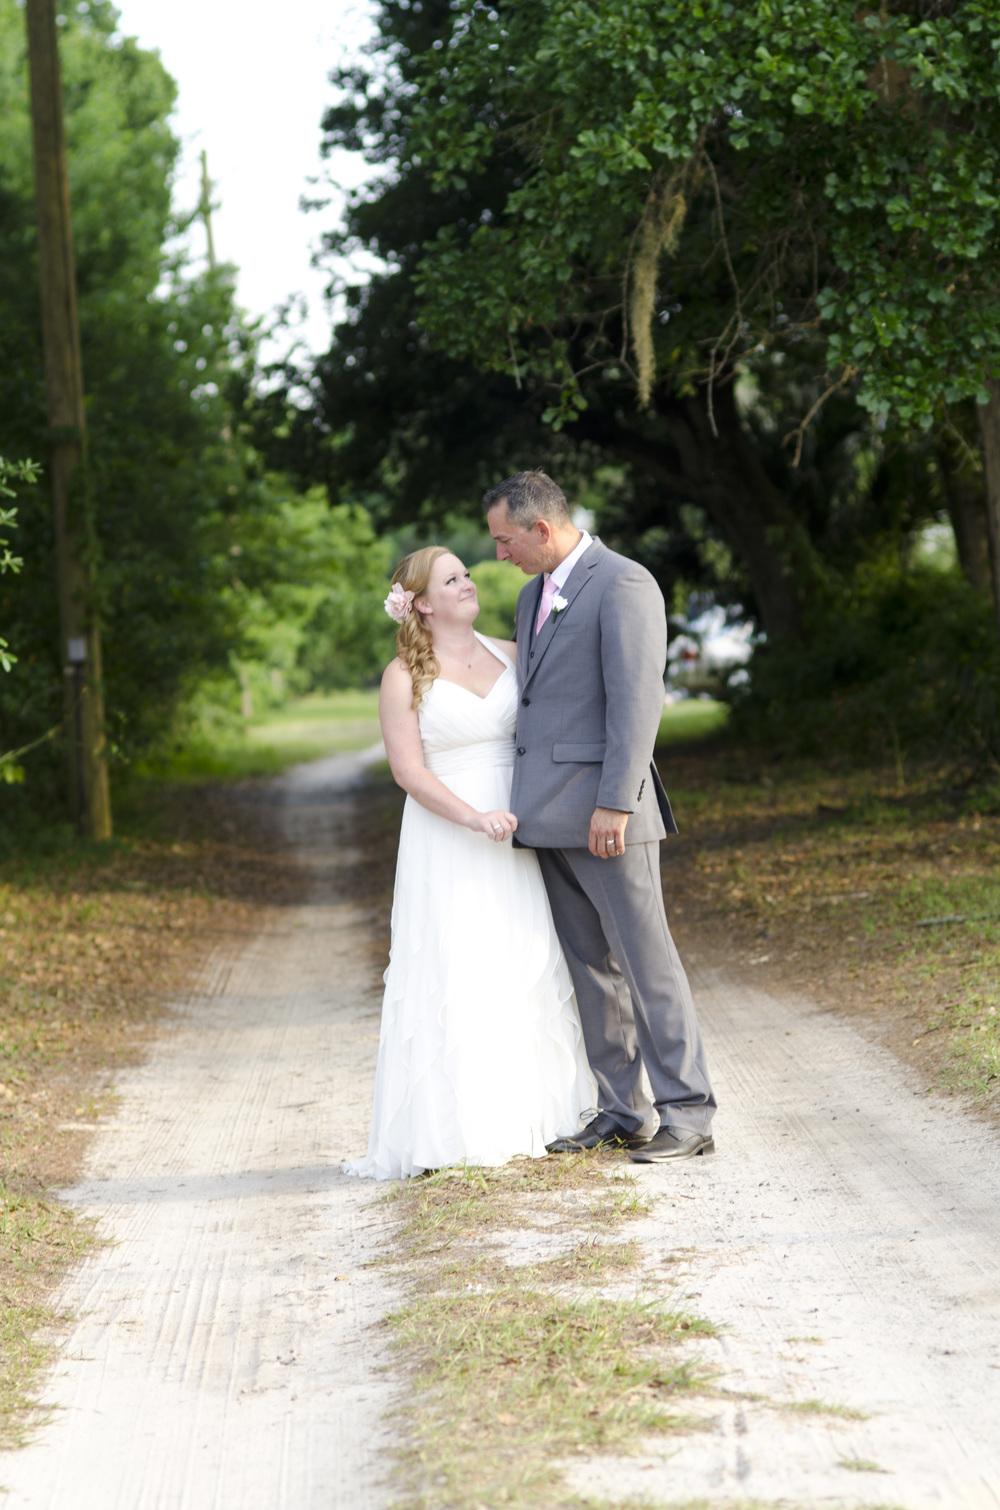 wedding photo poses - alaska wedding